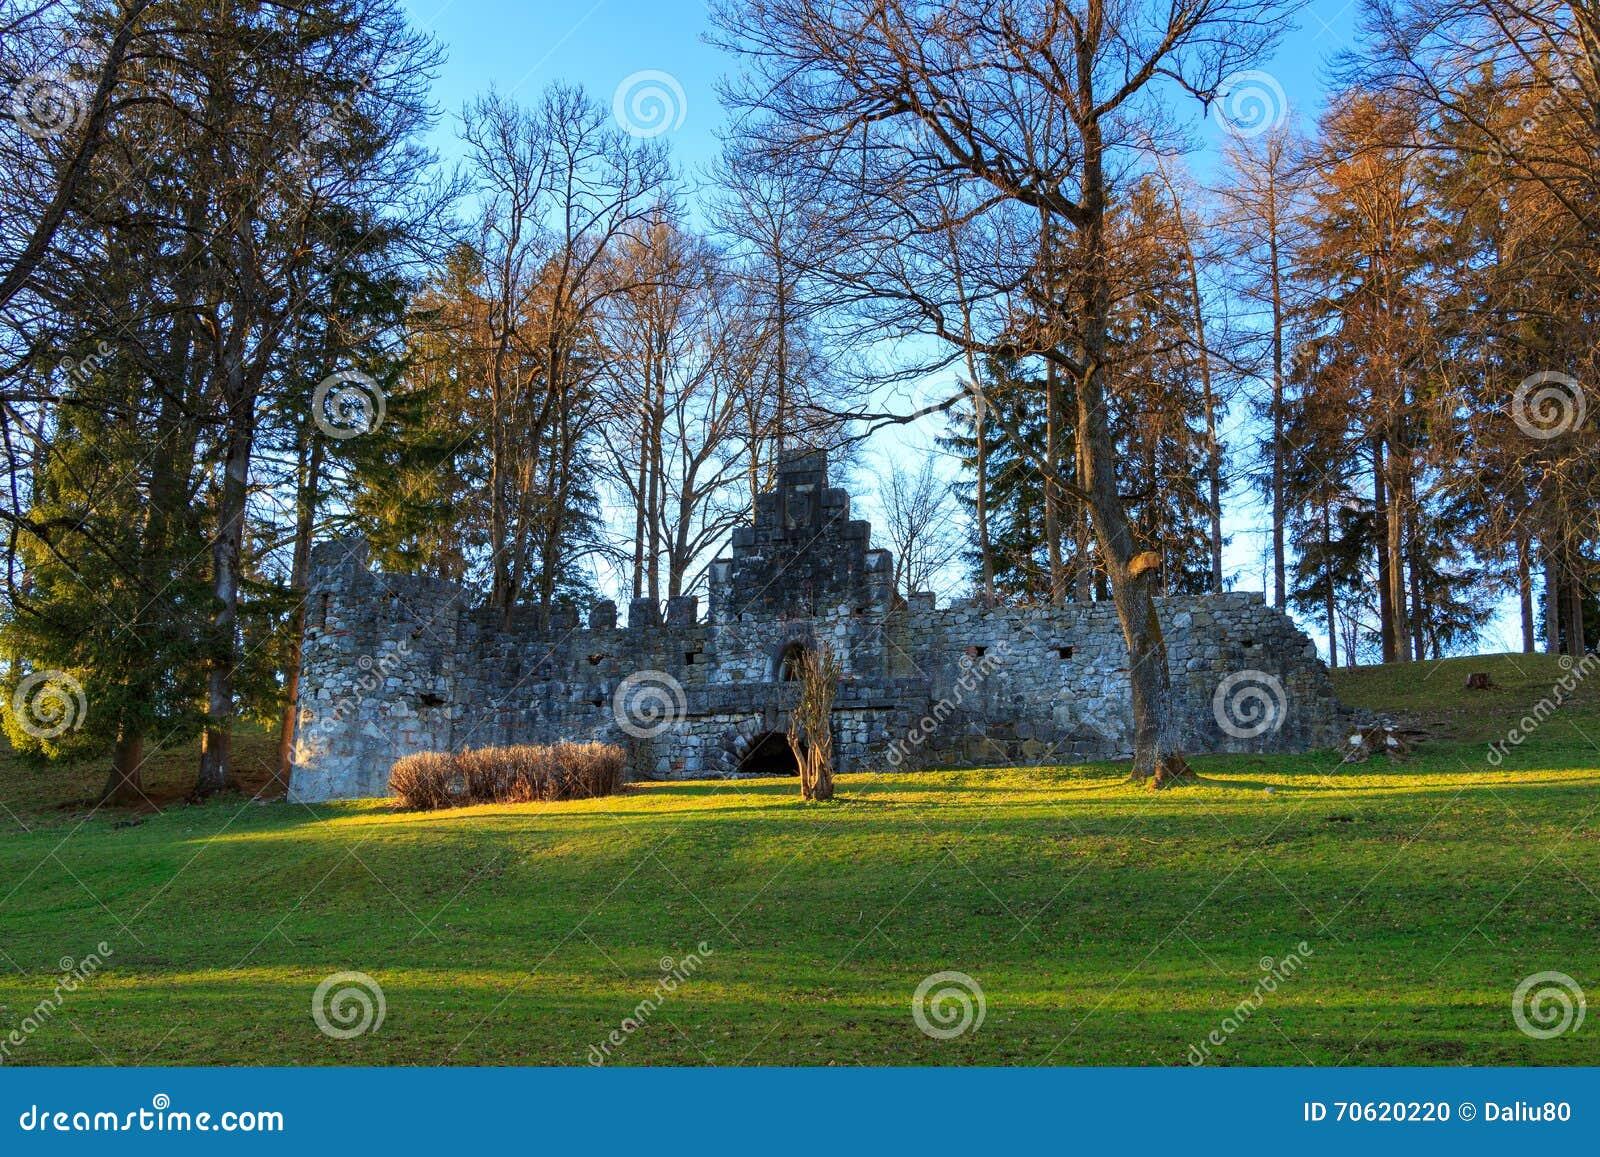 trees germany grass - photo #15